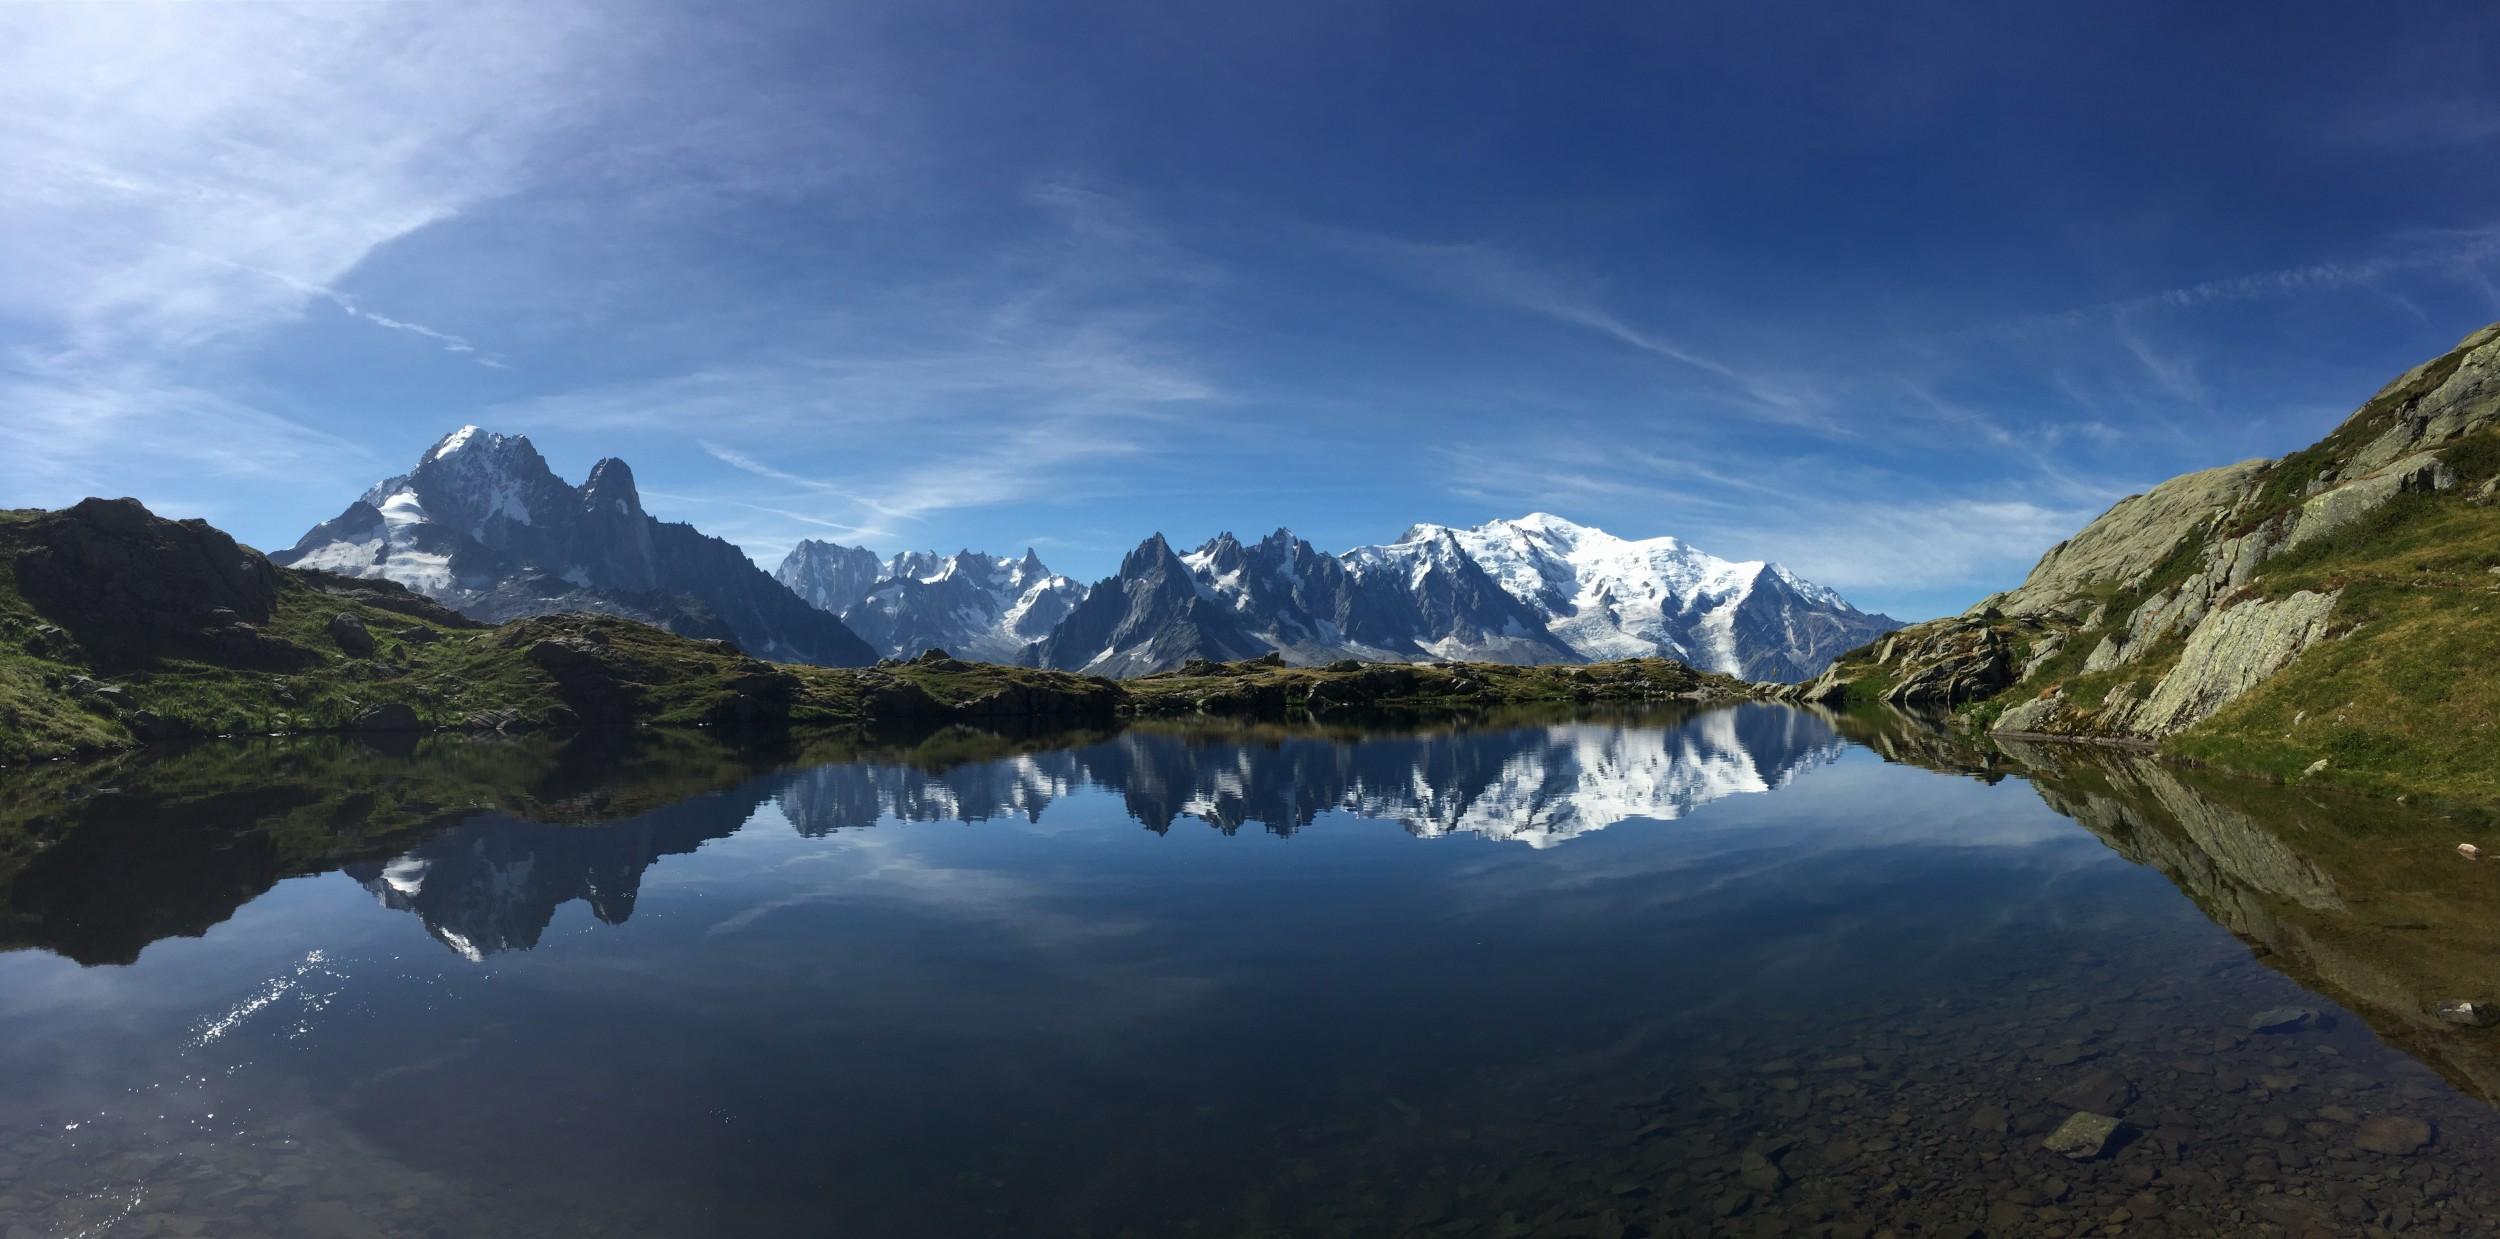 Rando vers le Lac Blanc